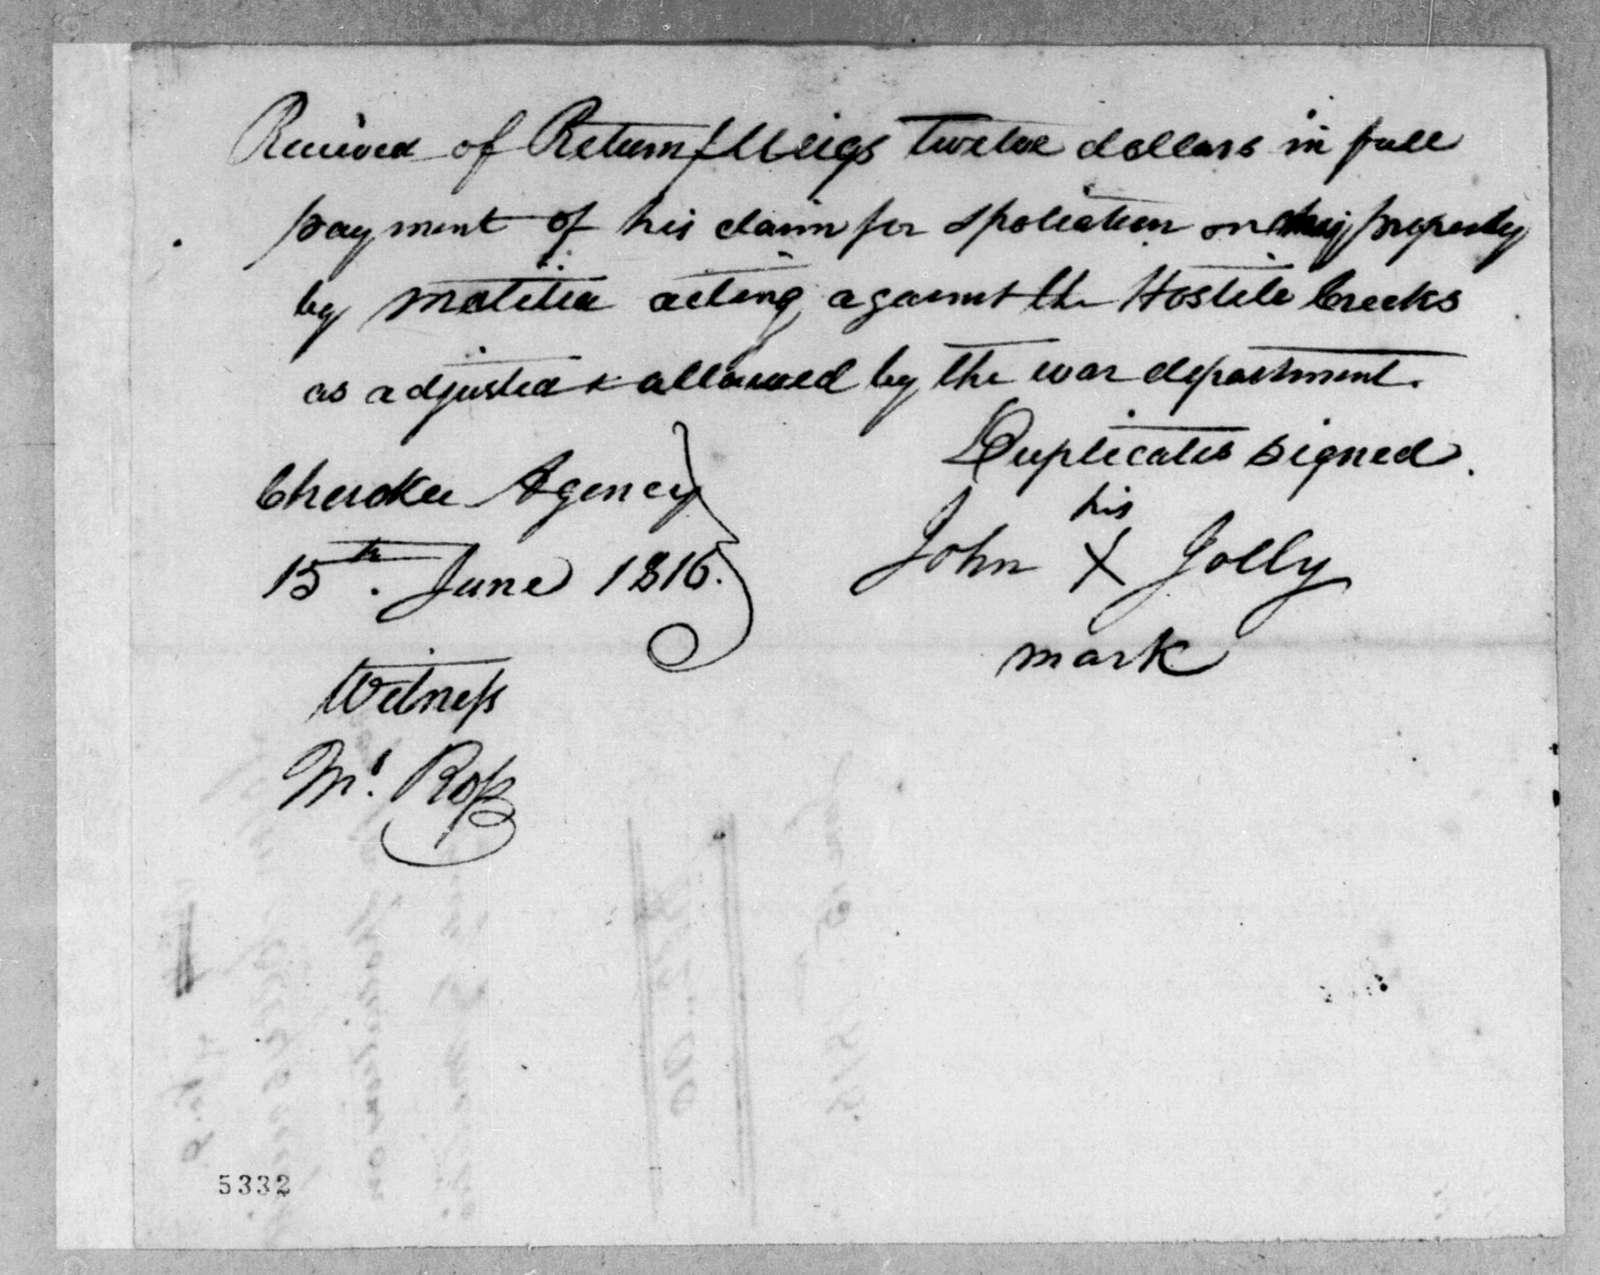 John Jolly to Return Jonathan Meigs, June 15, 1816